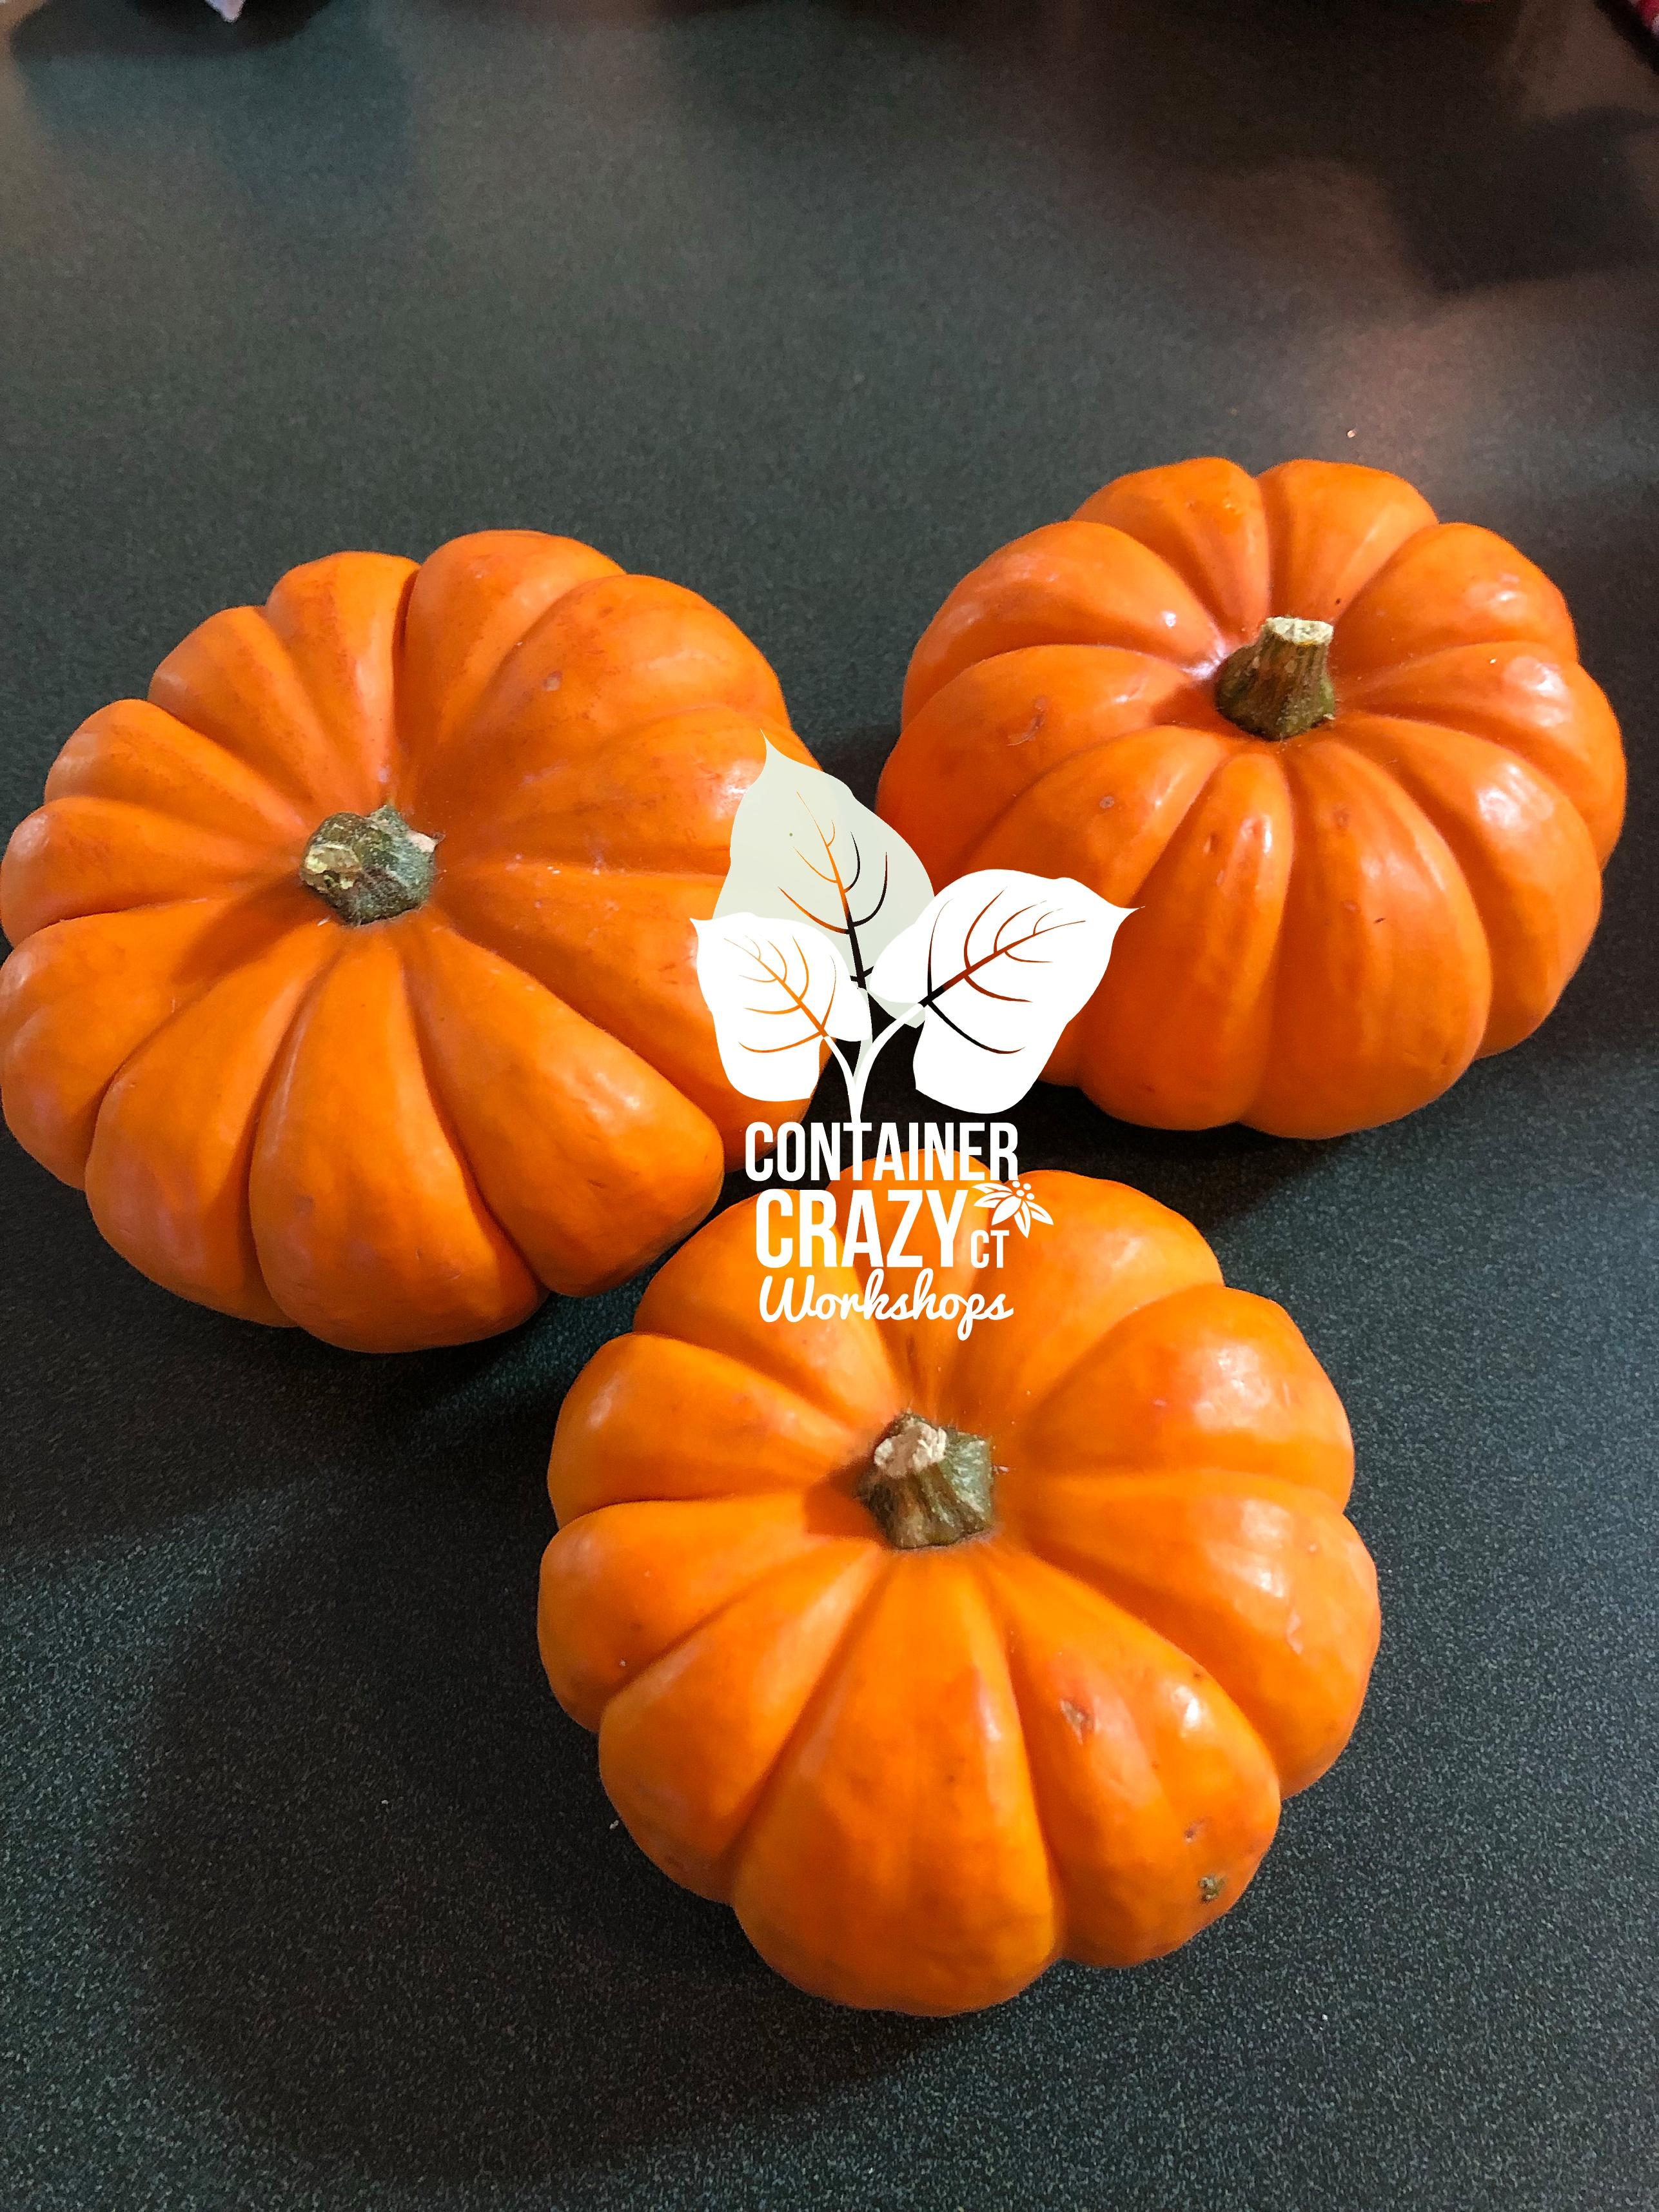 Succ Pumpkins 2019 by C Testa Copywrite_0001